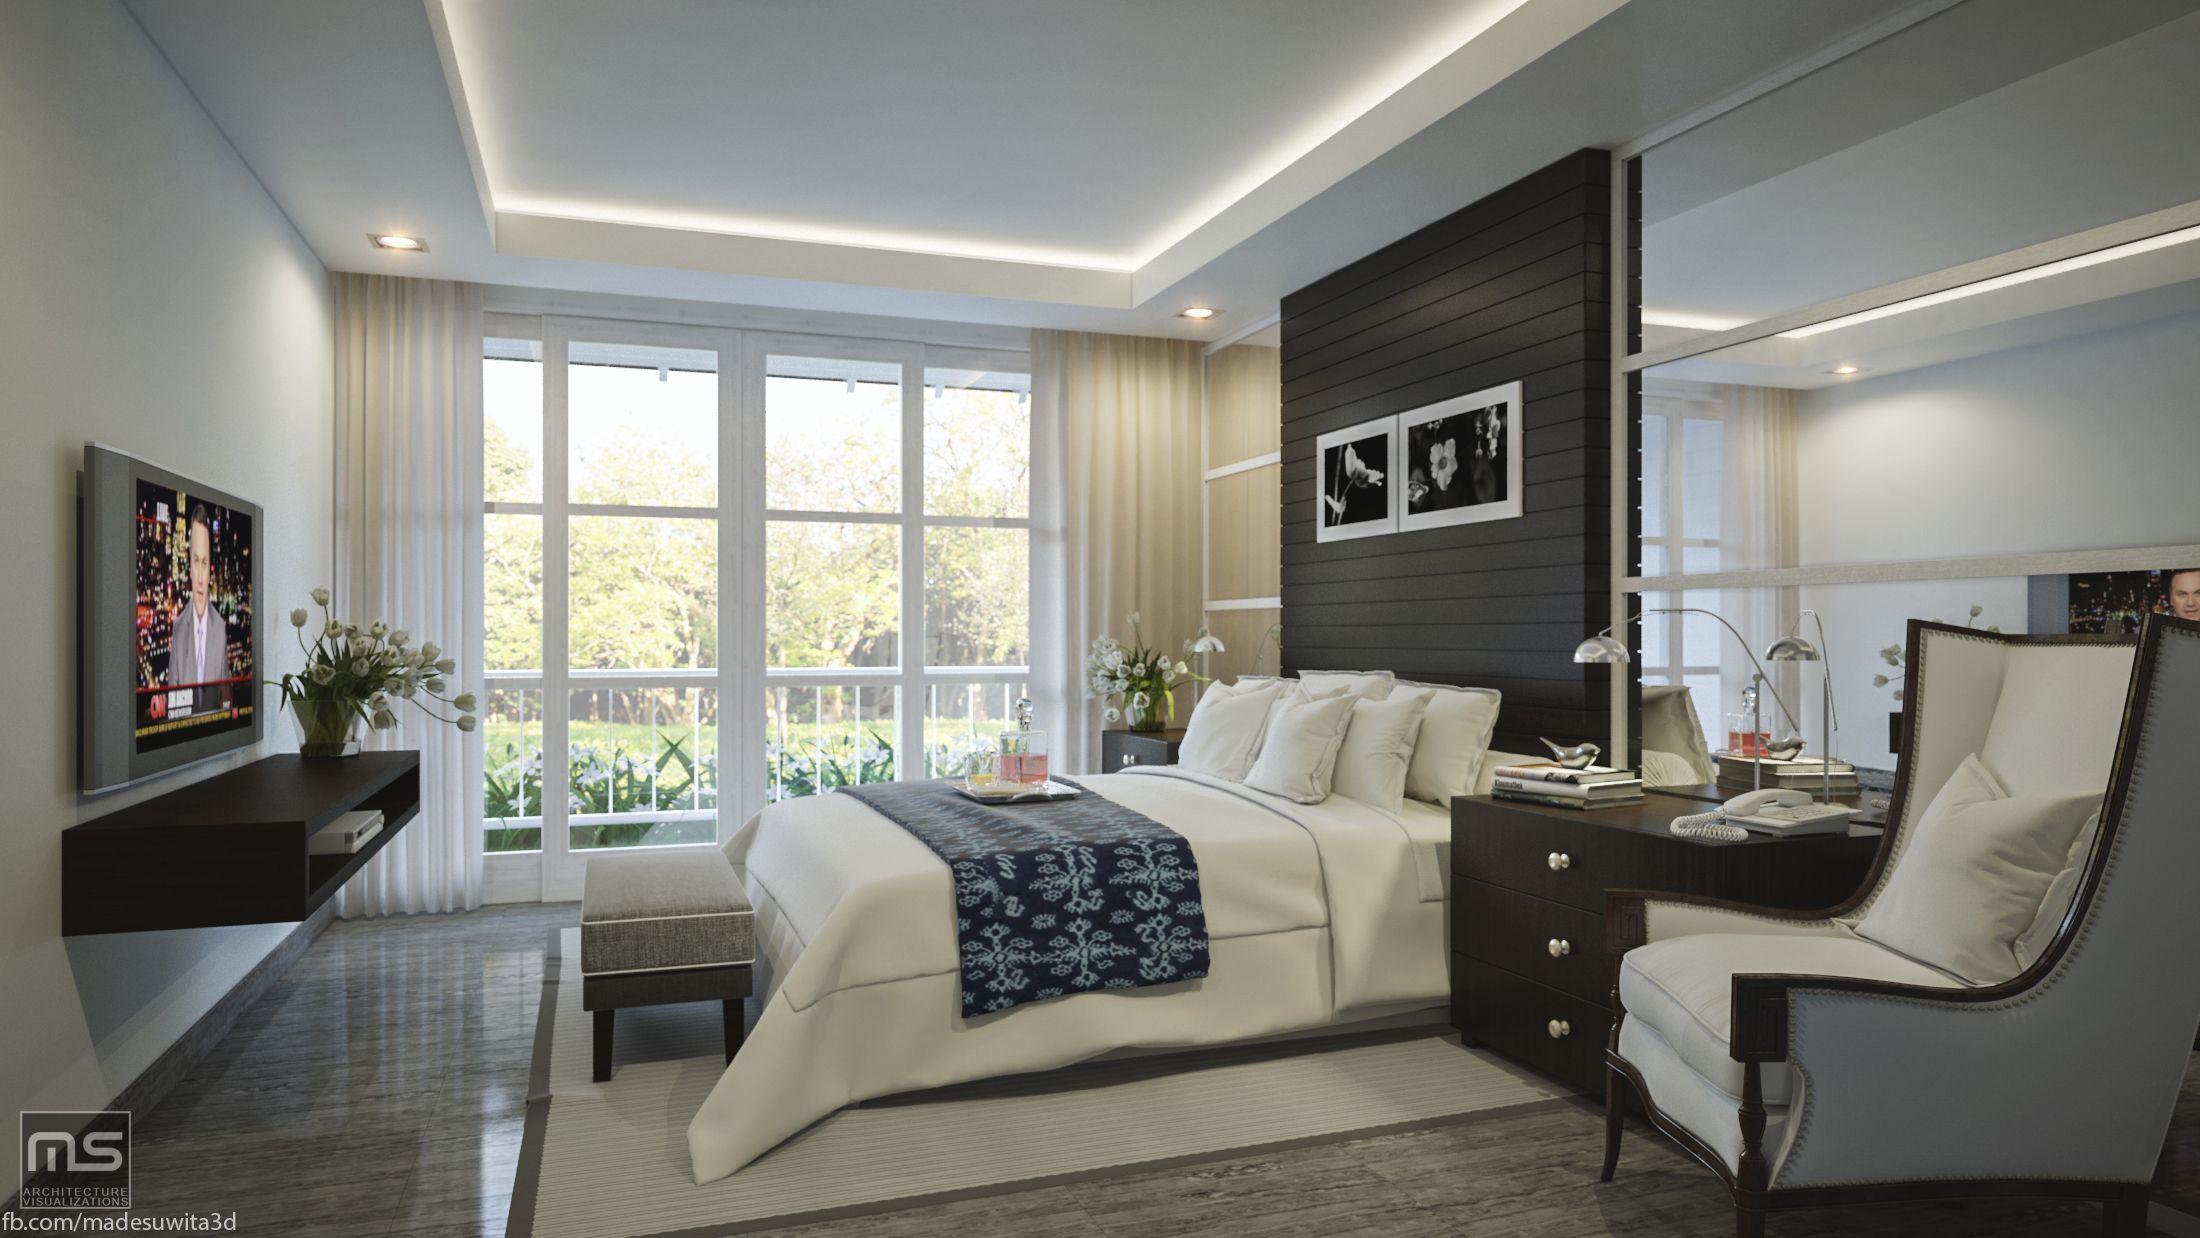 Mix Interior Renderings 3d Model Apartment Bedroom Interior